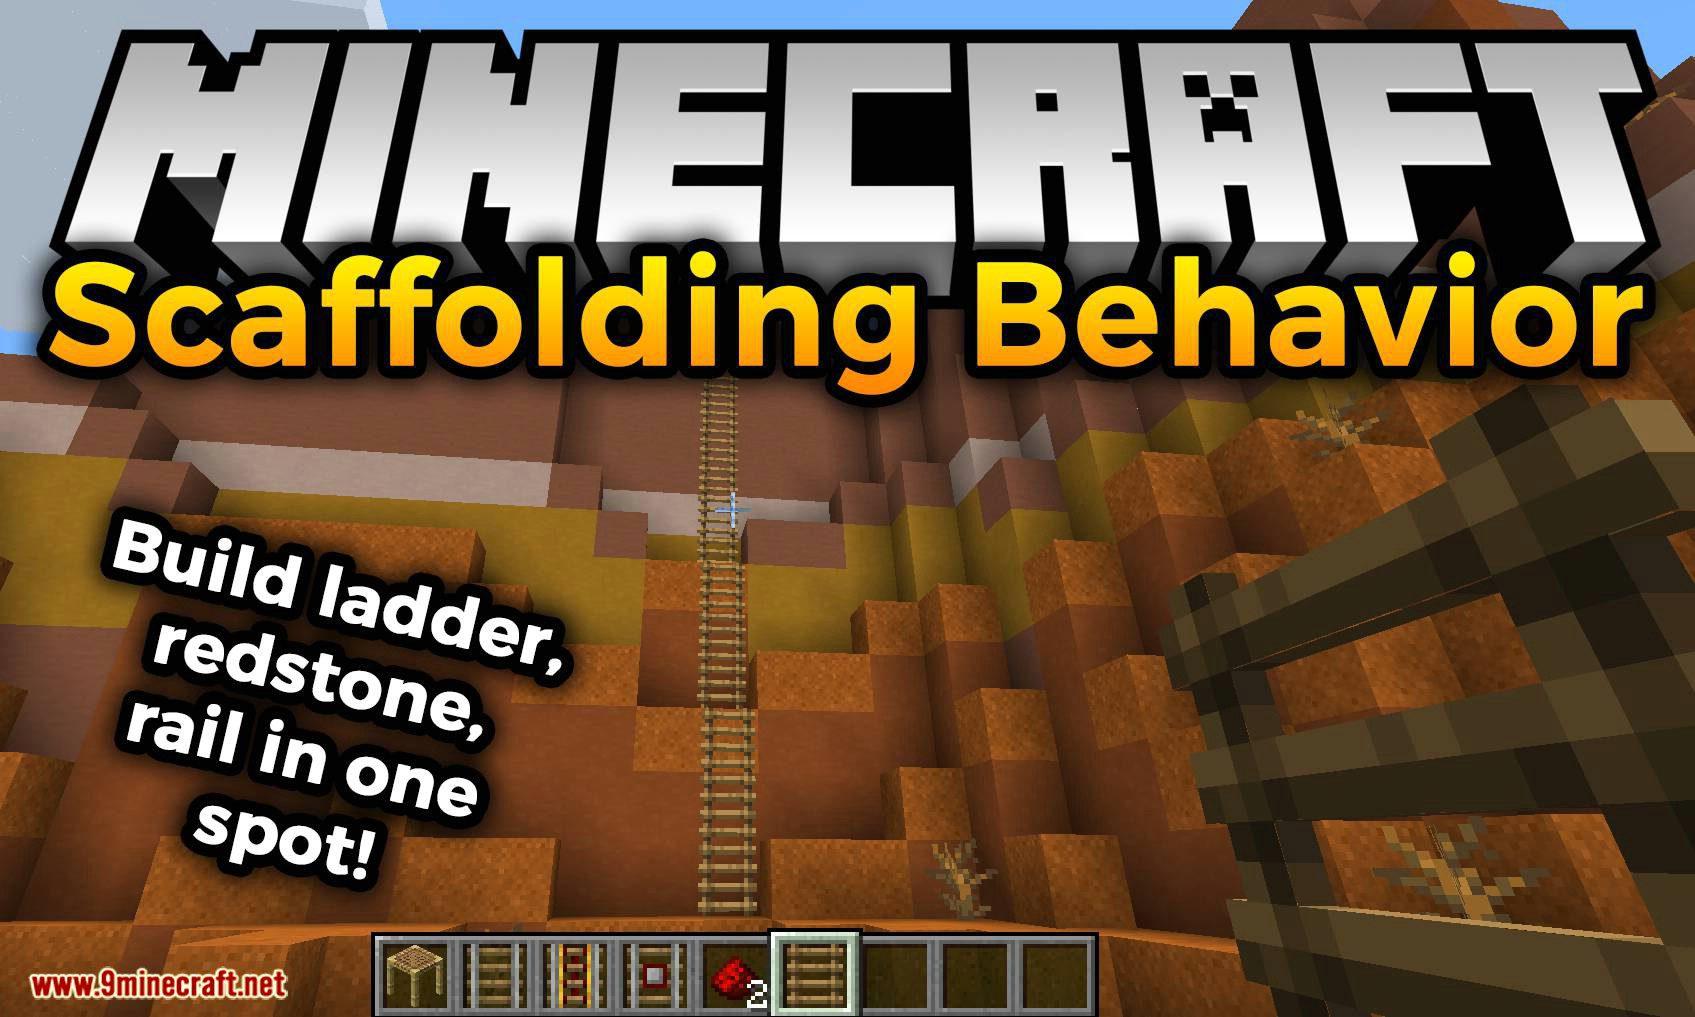 Scaffolding behavior mod for minecraft logo